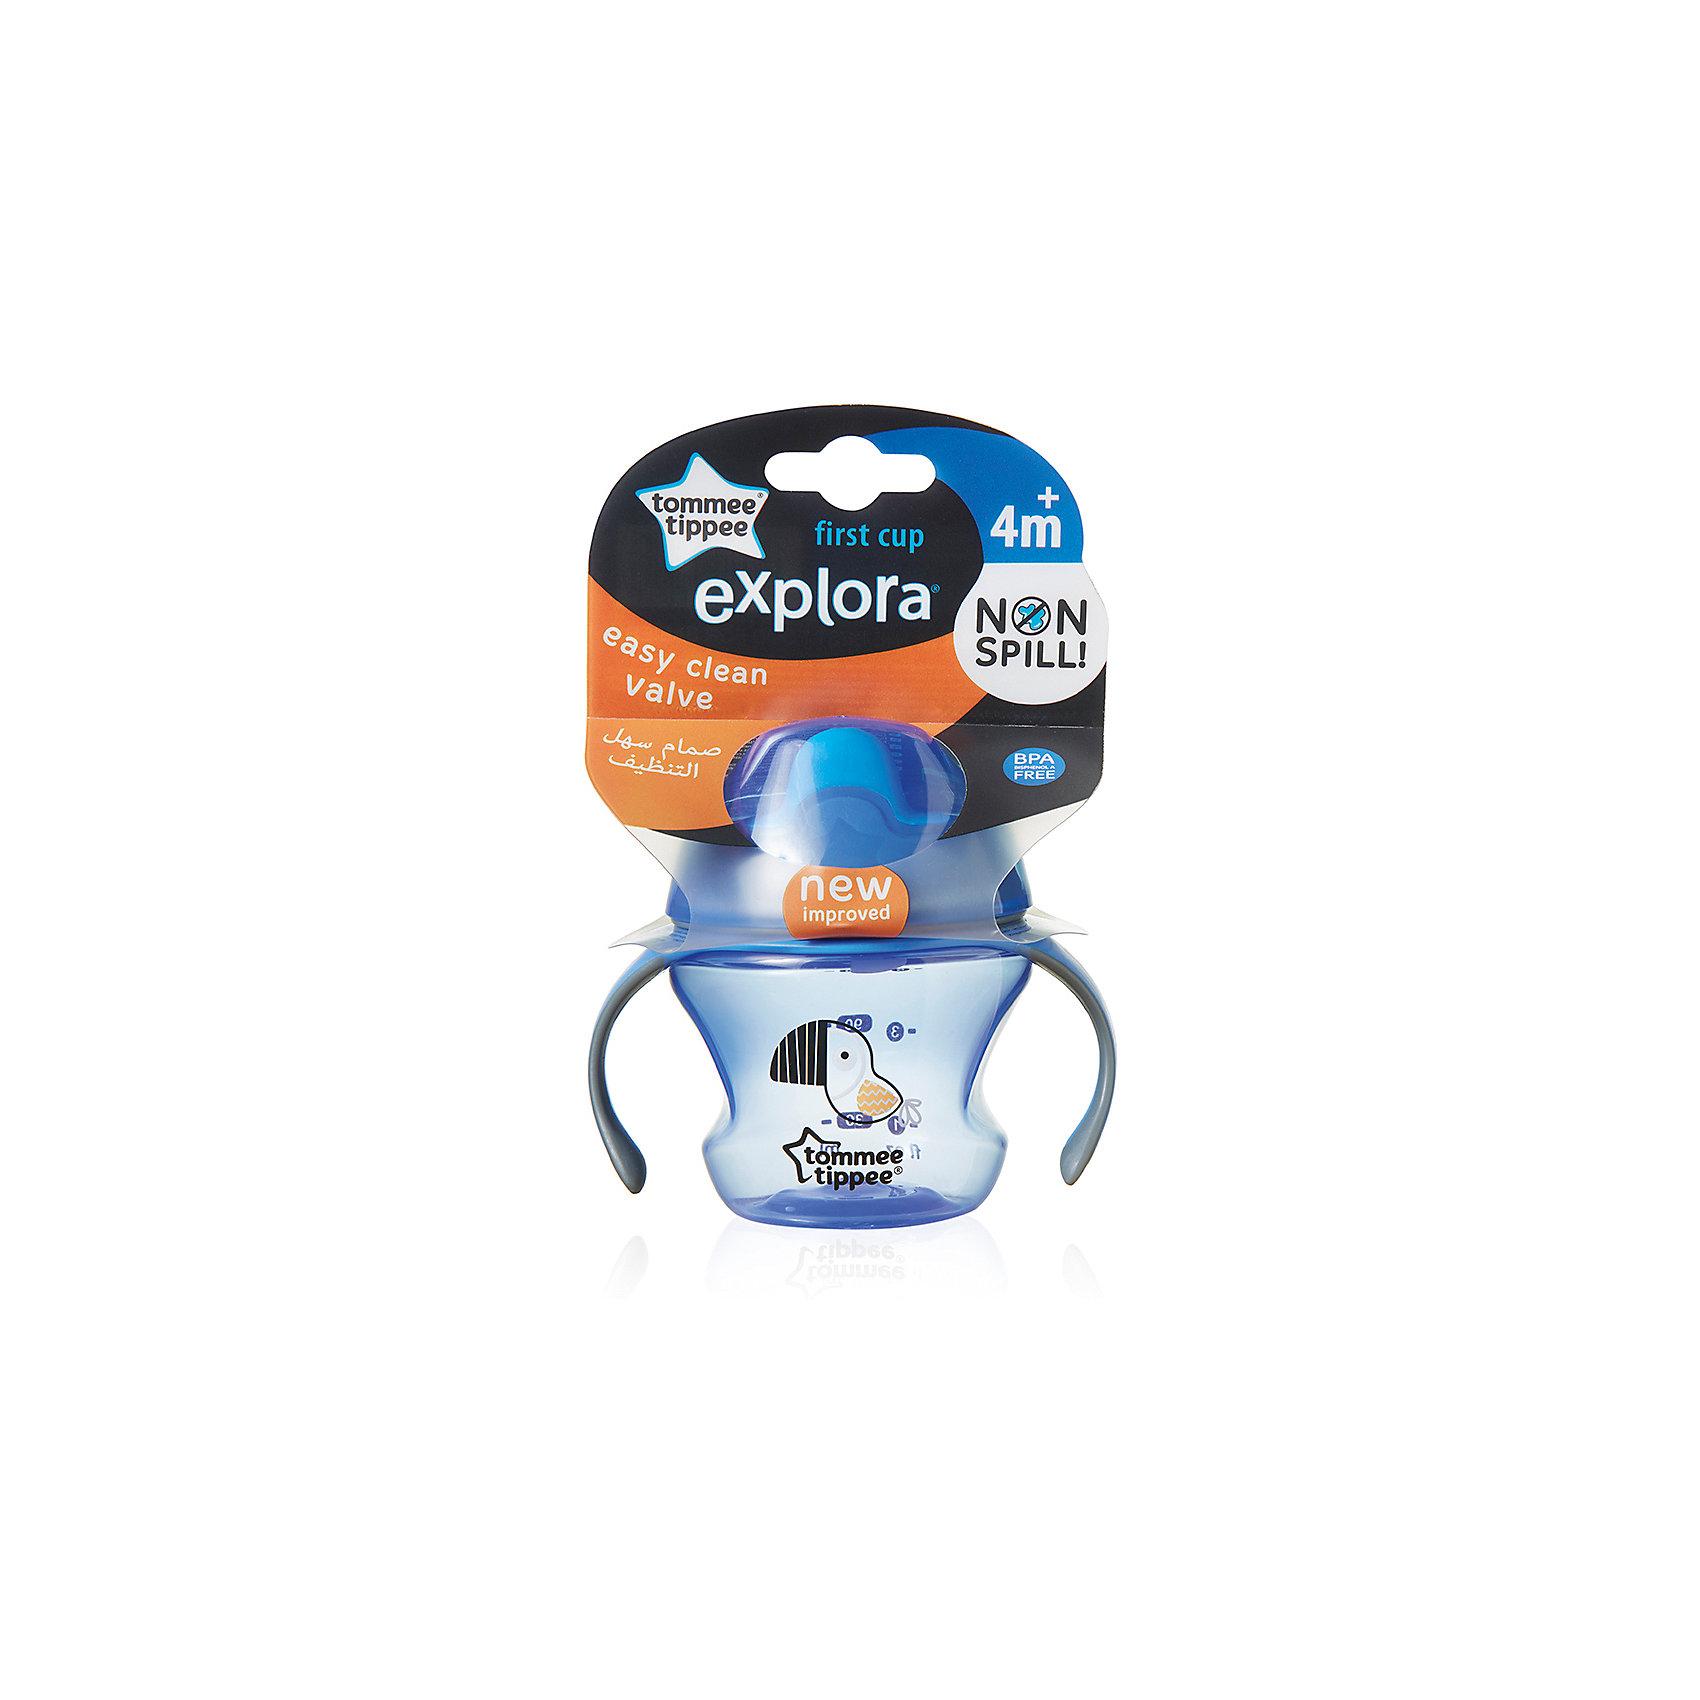 Поильник Tommee Tippee Explora Первая чашка от 4 мес, 150 мл, голубой